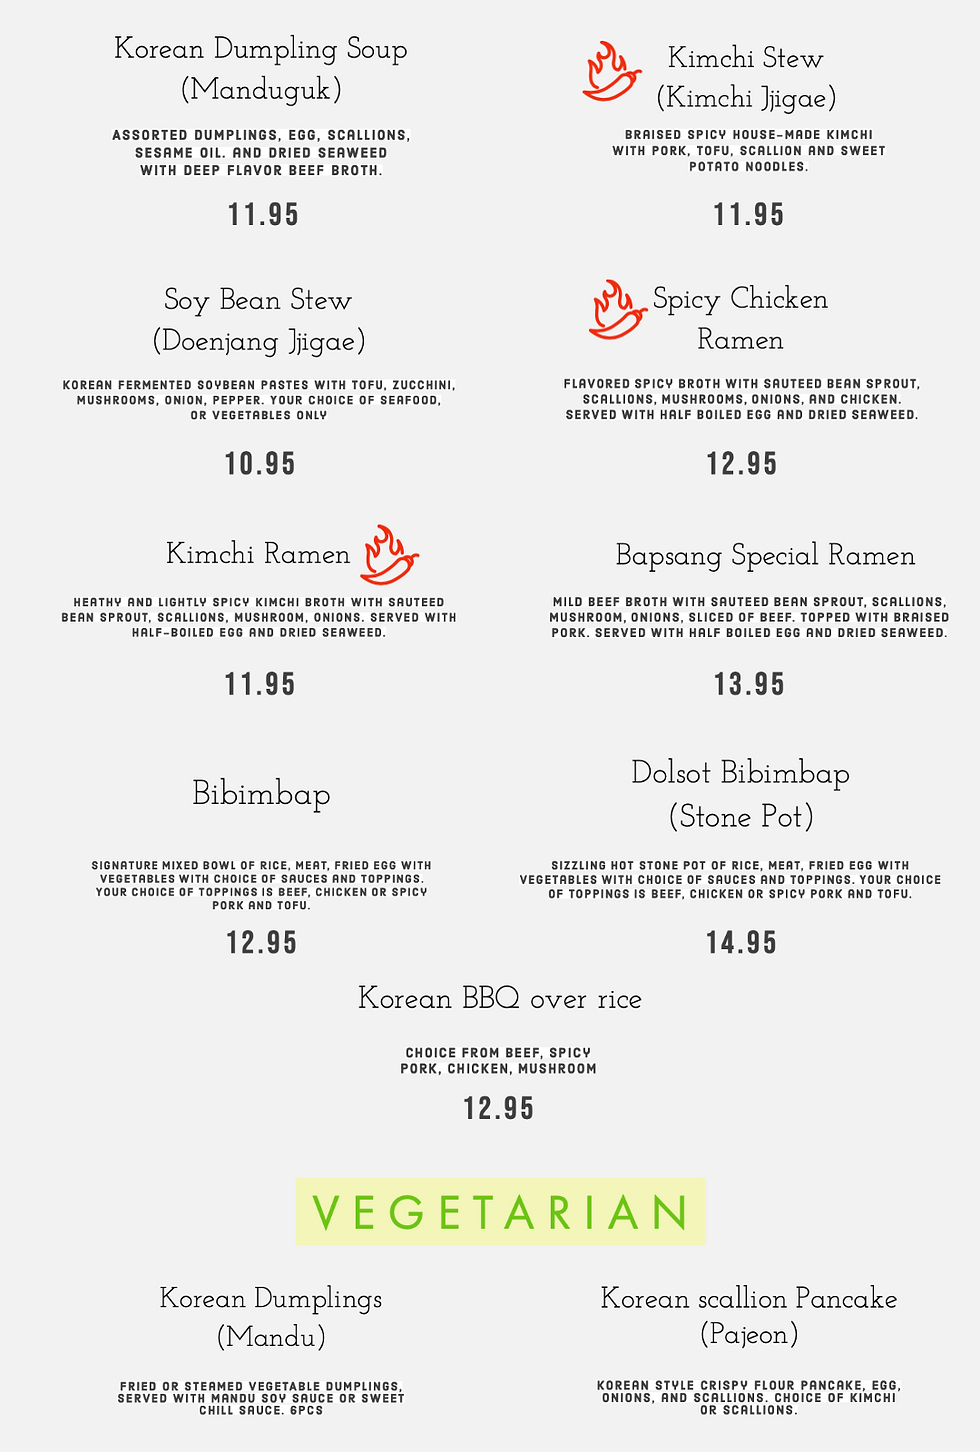 Bapsang menu 8.png